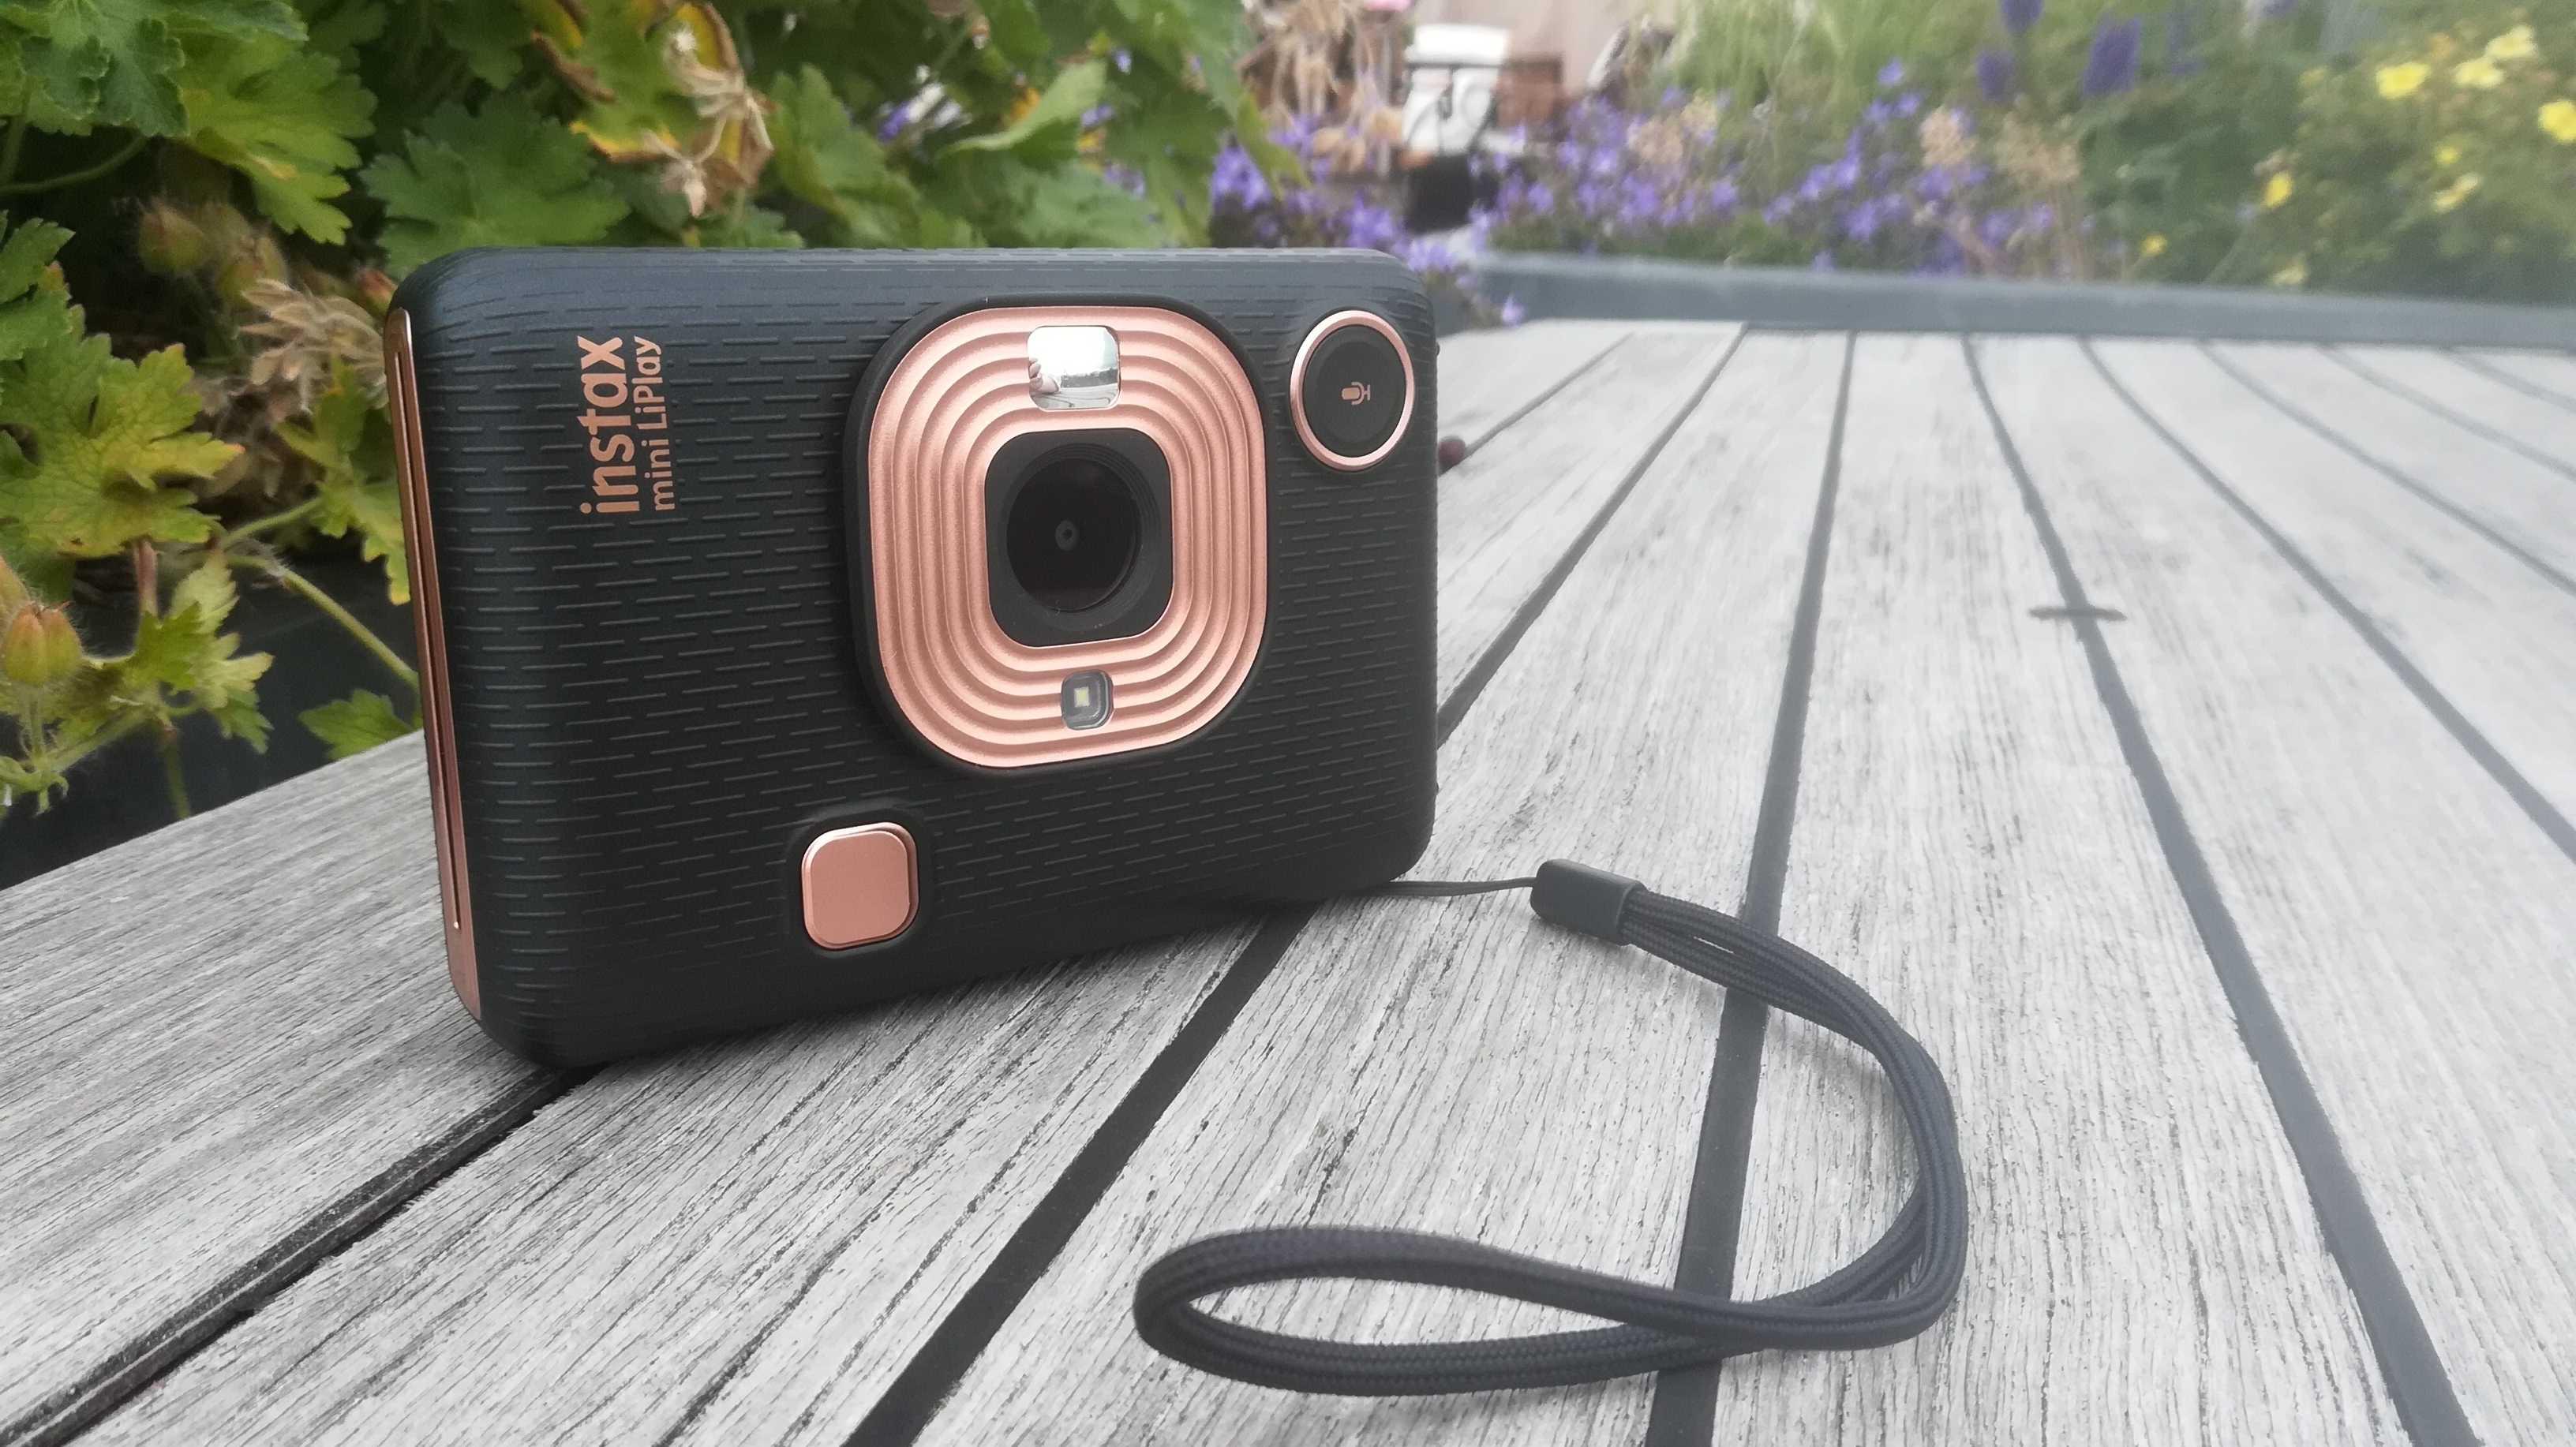 Sofortbildkamera mit Soundfunktion: die Fujifilm instax mini LiPlay